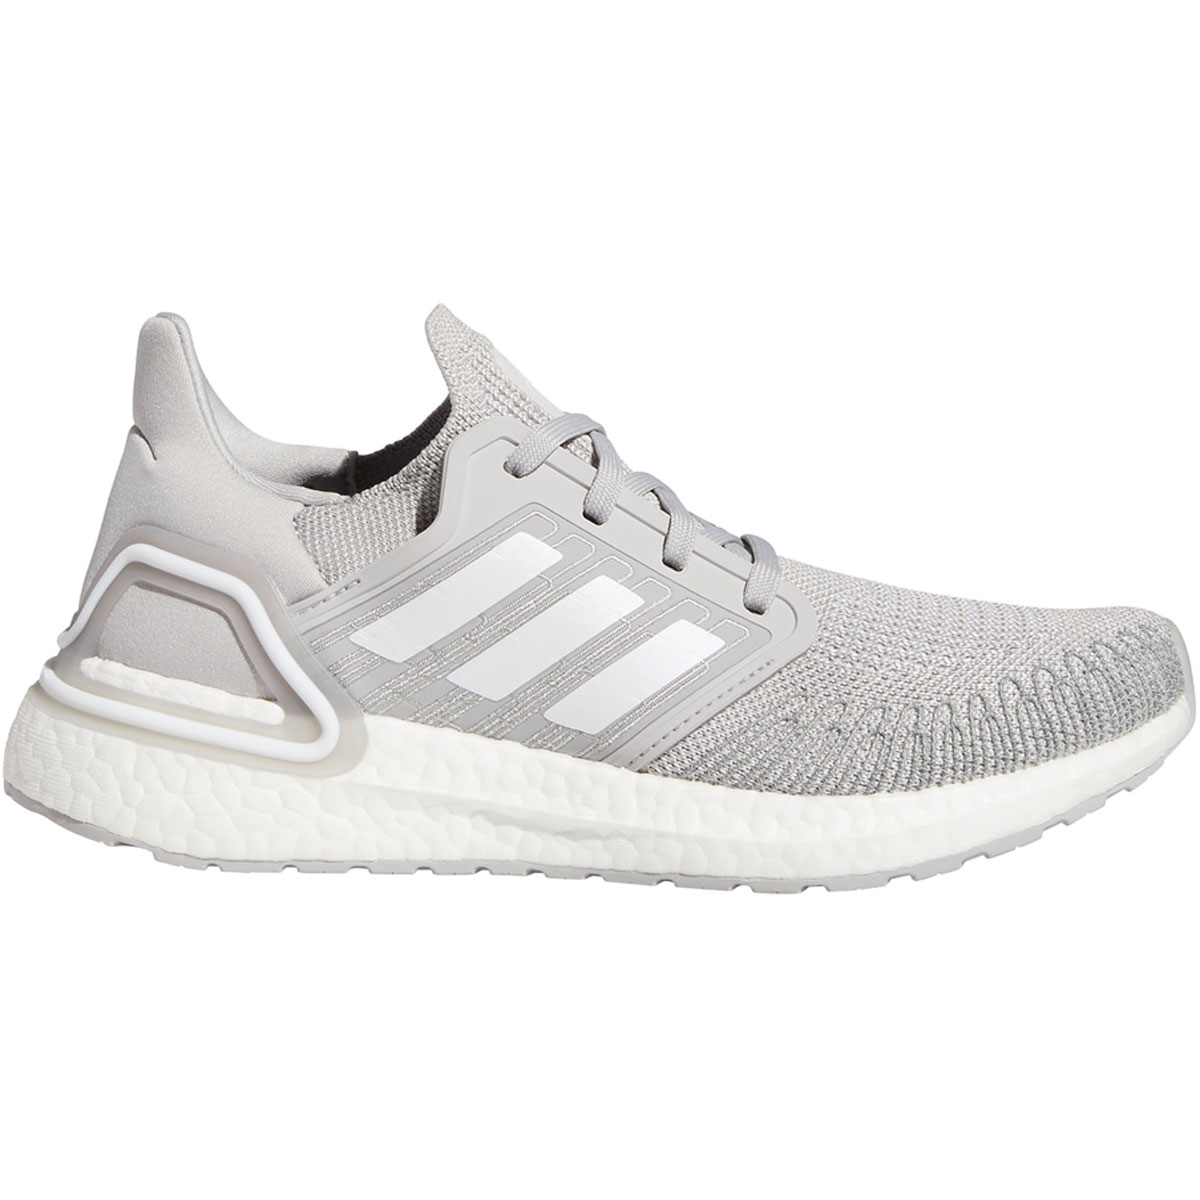 Women's Adidas Ultraboost 20 Running Shoe - Color: Grey - Size: 5 - Width: Regular, Grey, large, image 1